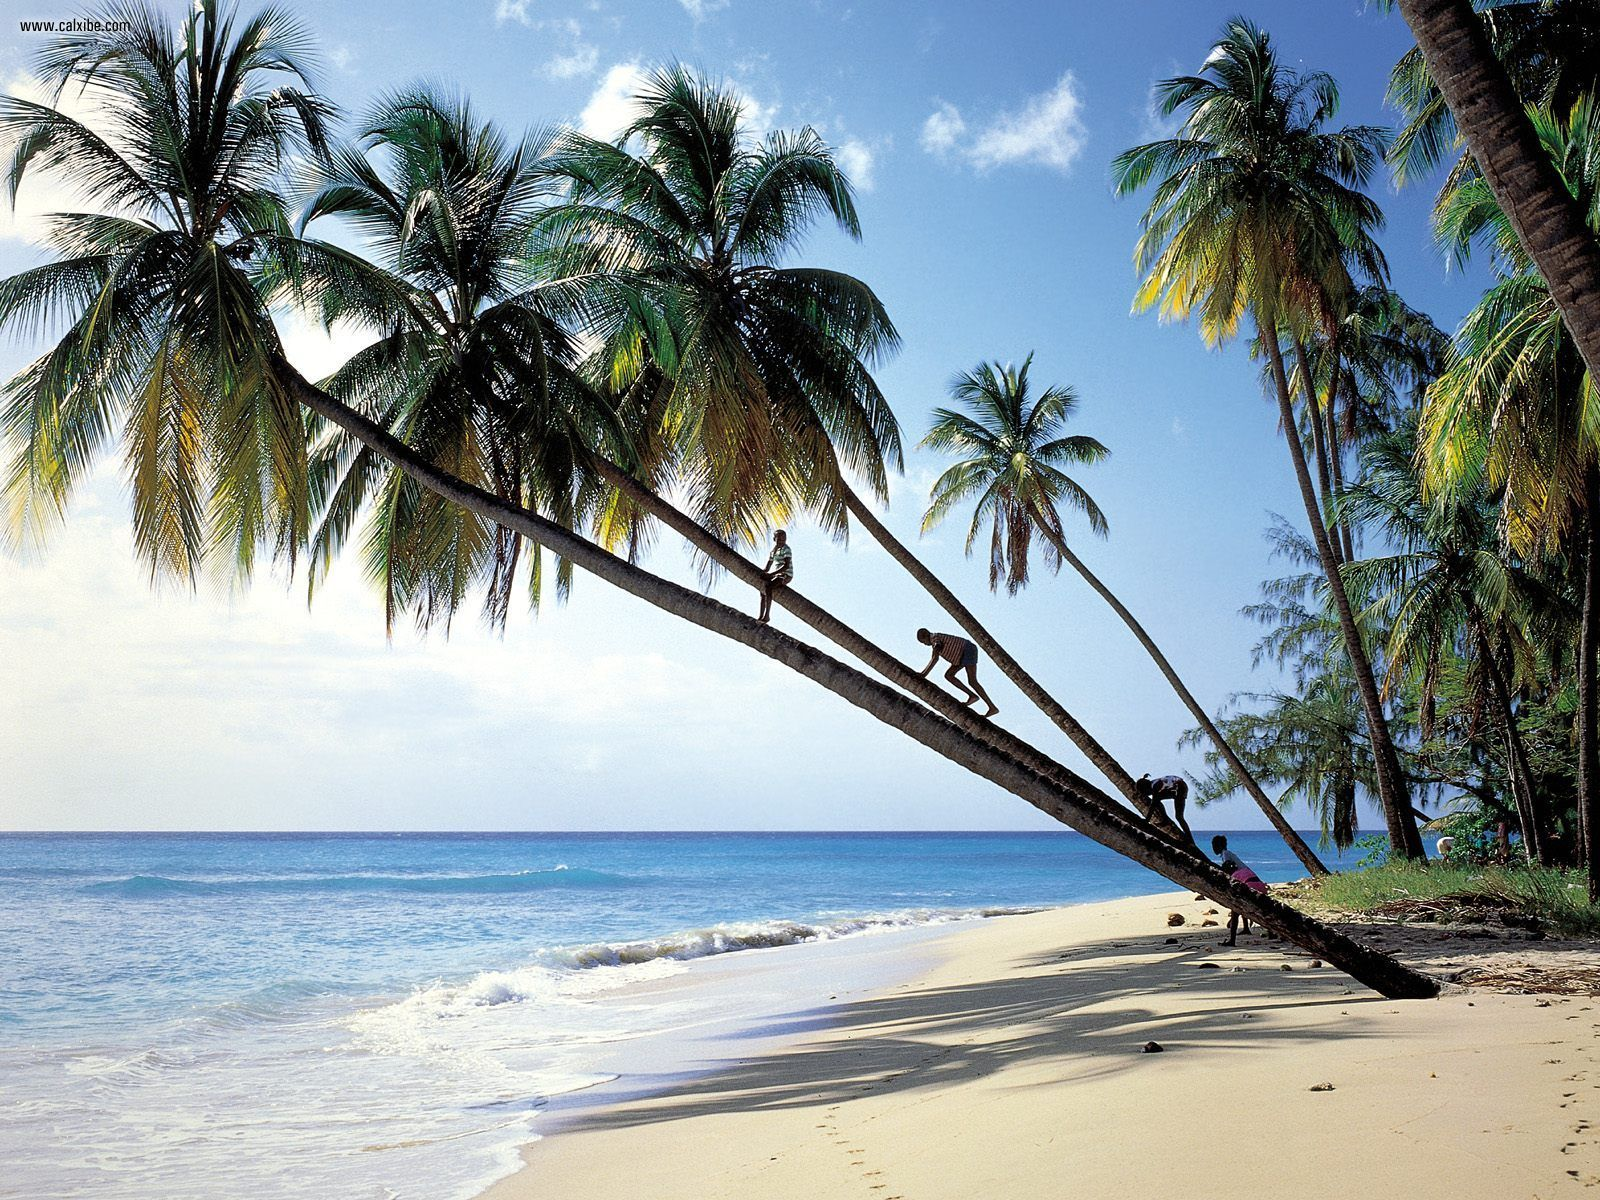 Gibbs_Beach_Mullins_Bay_Barbados.jpg